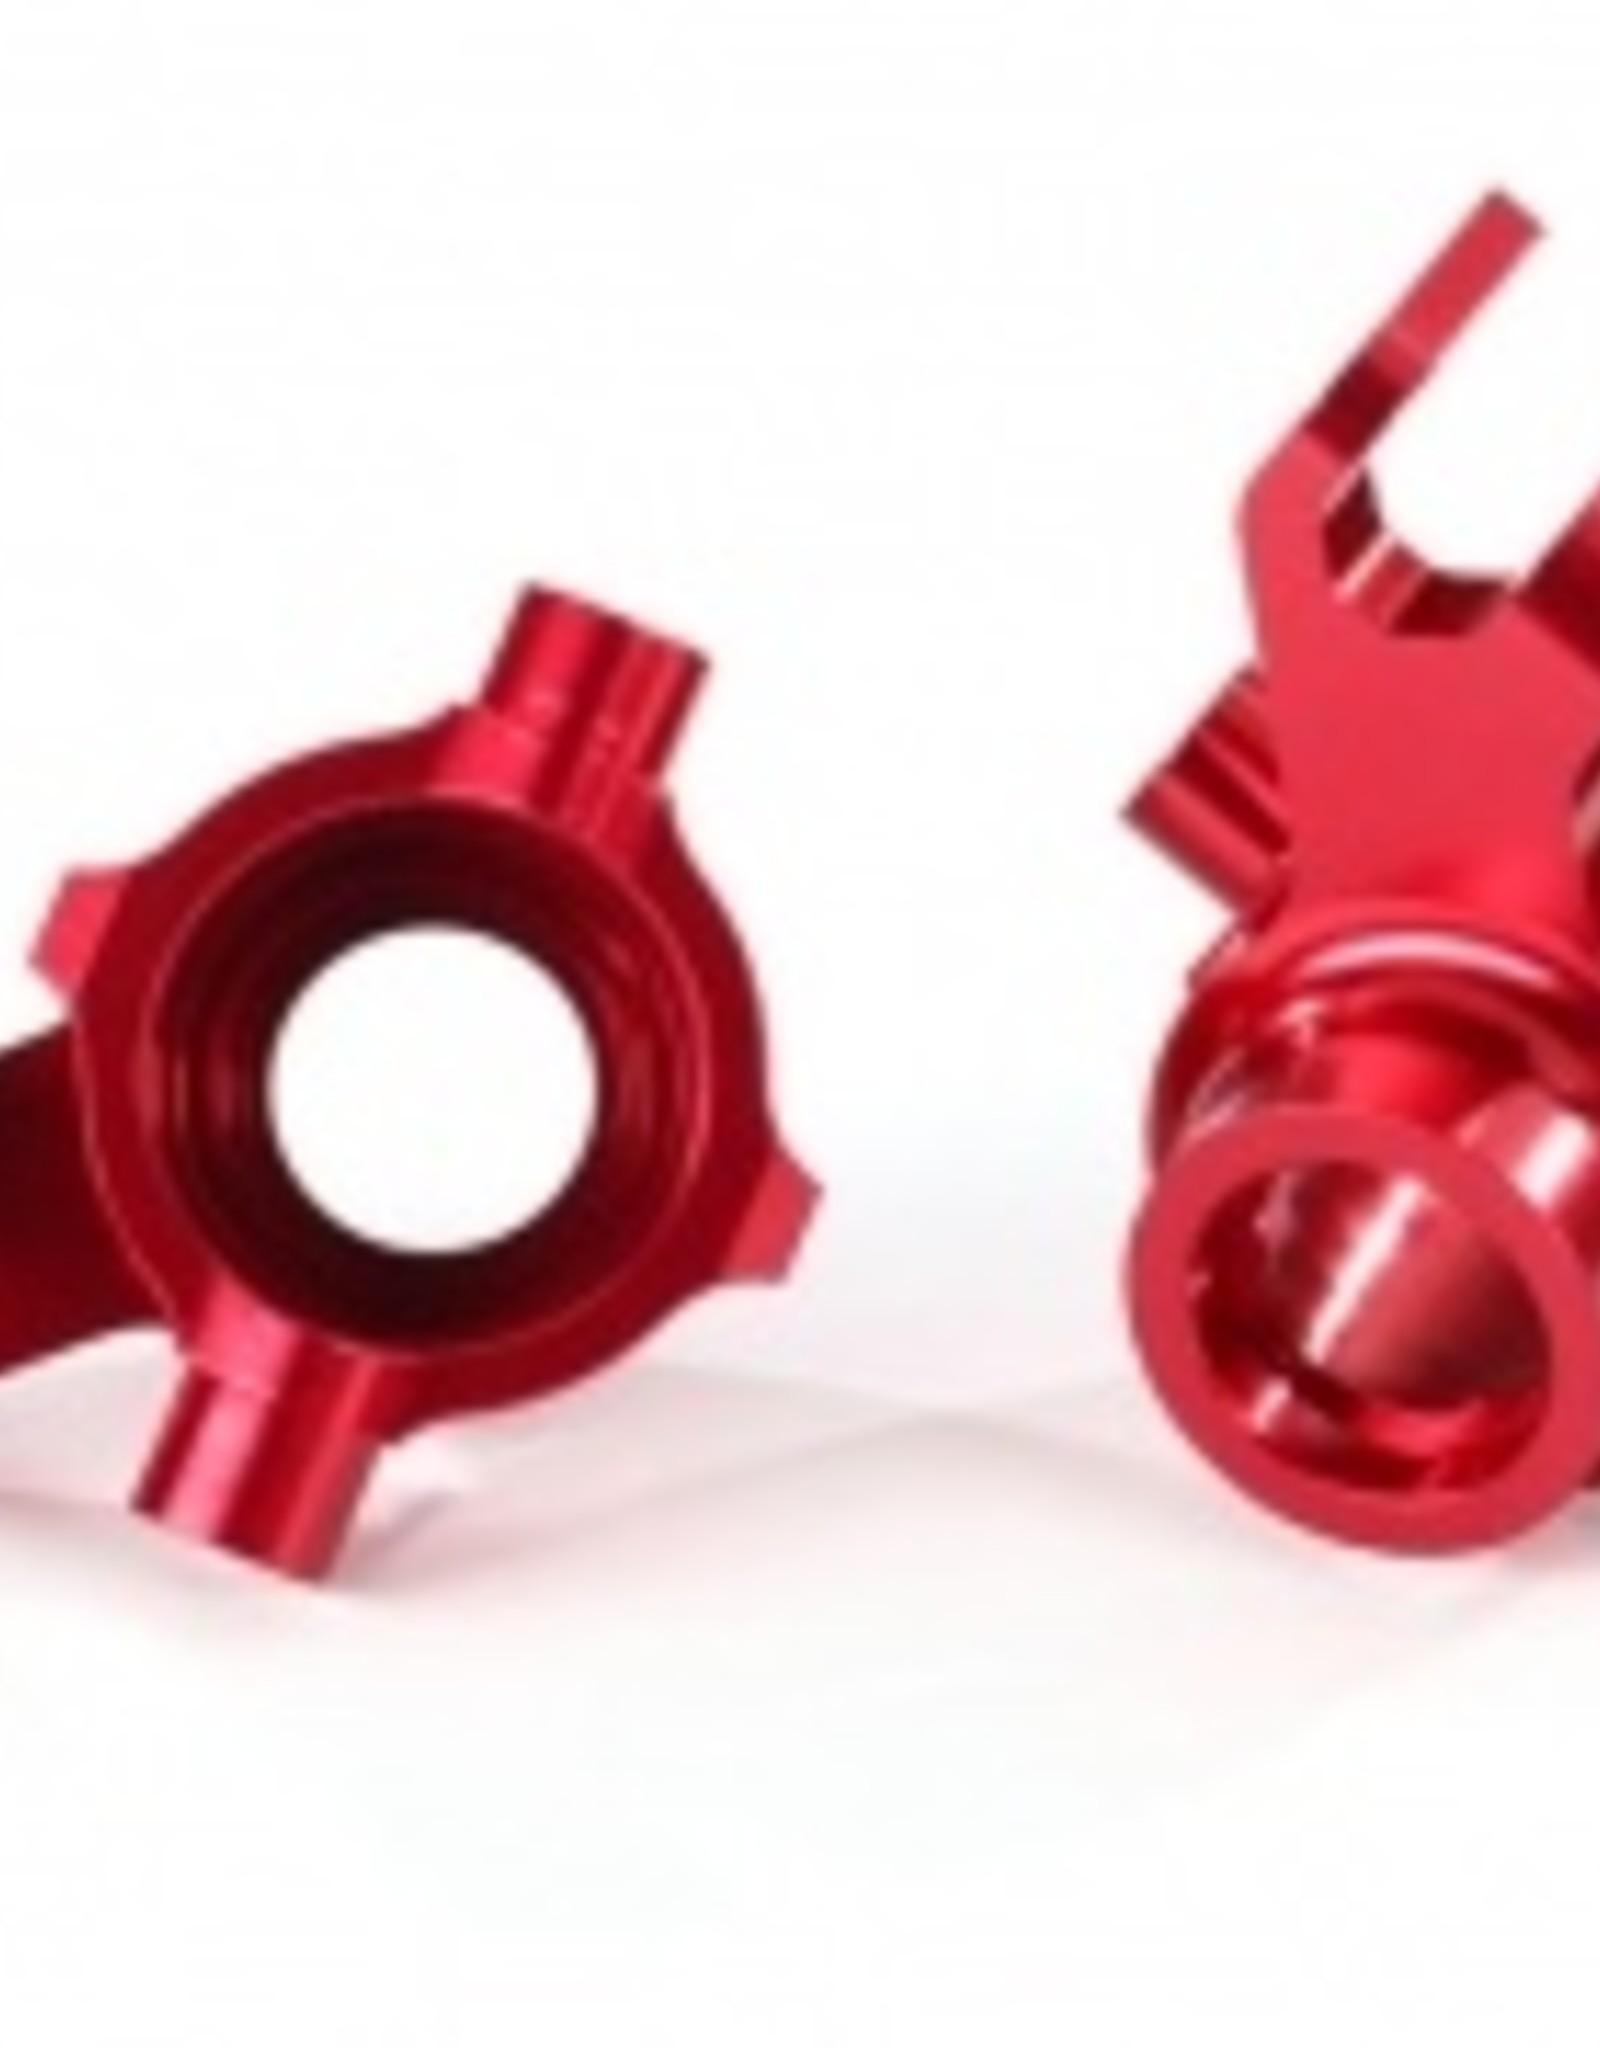 Traxxas Traxxas Maxx Steering blocks, 6061-T6 aluminum (red-anodized), left & right